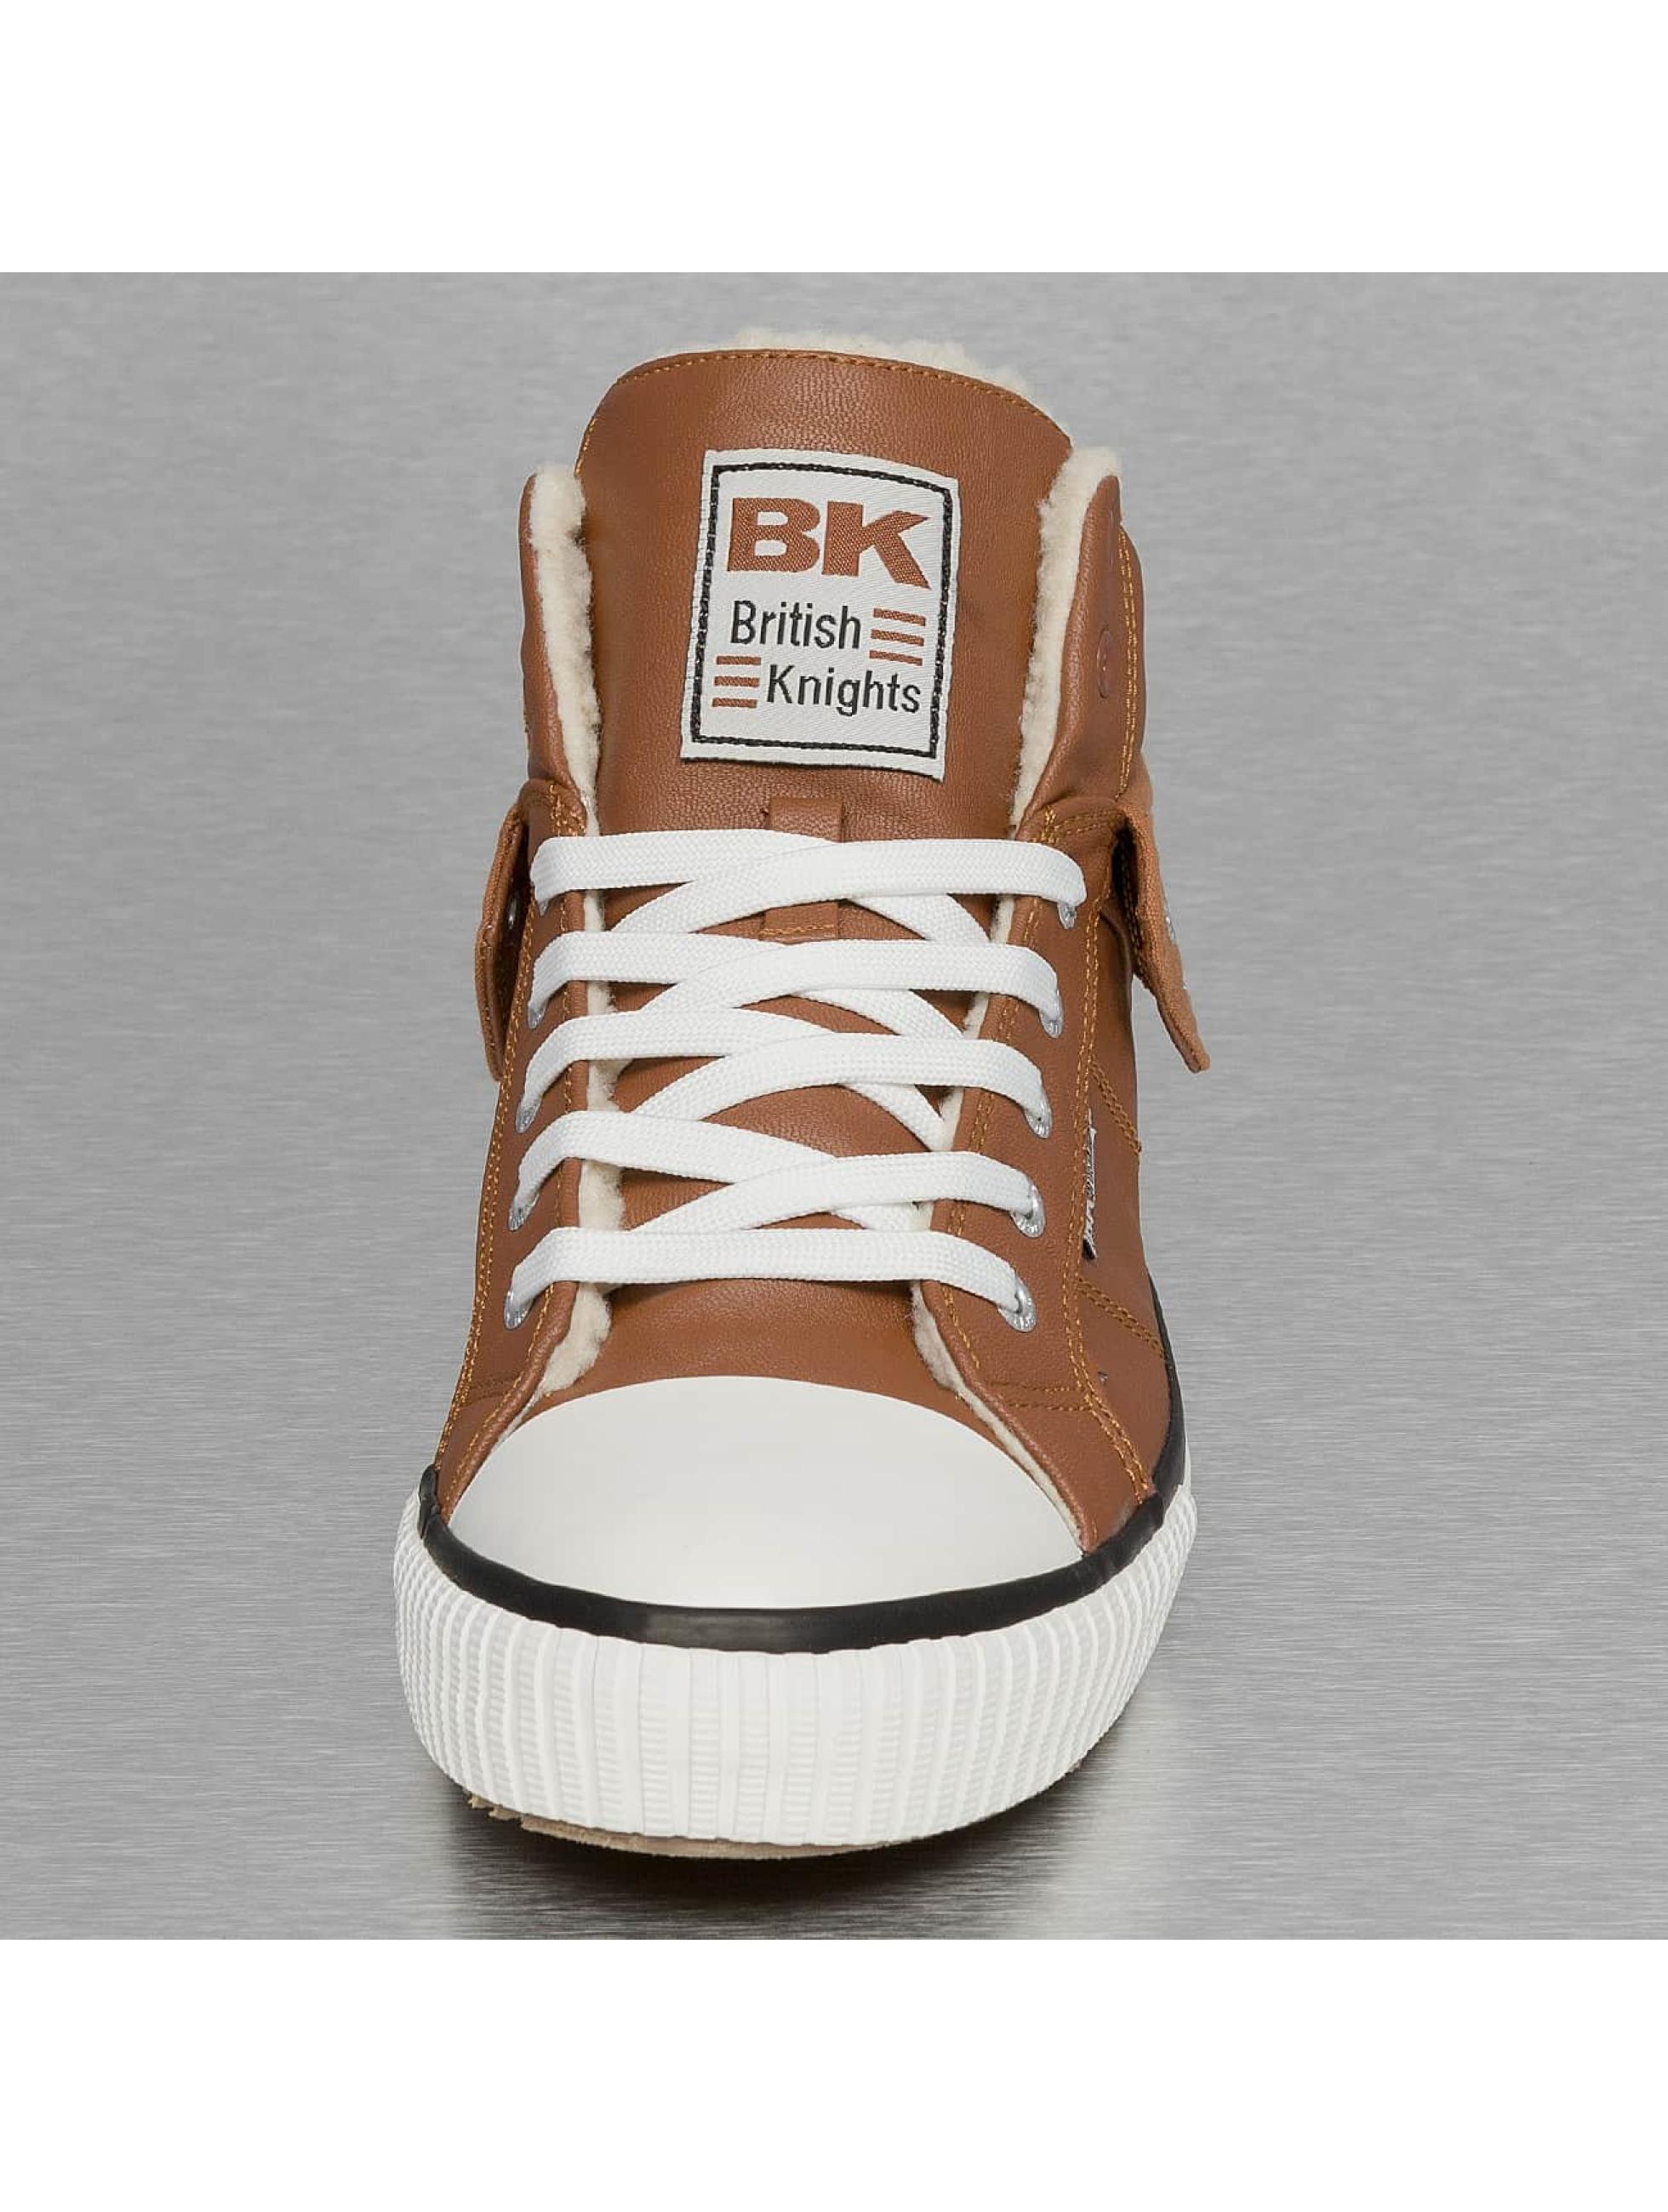 British Knights Baskets Roco PU WL Profile brun